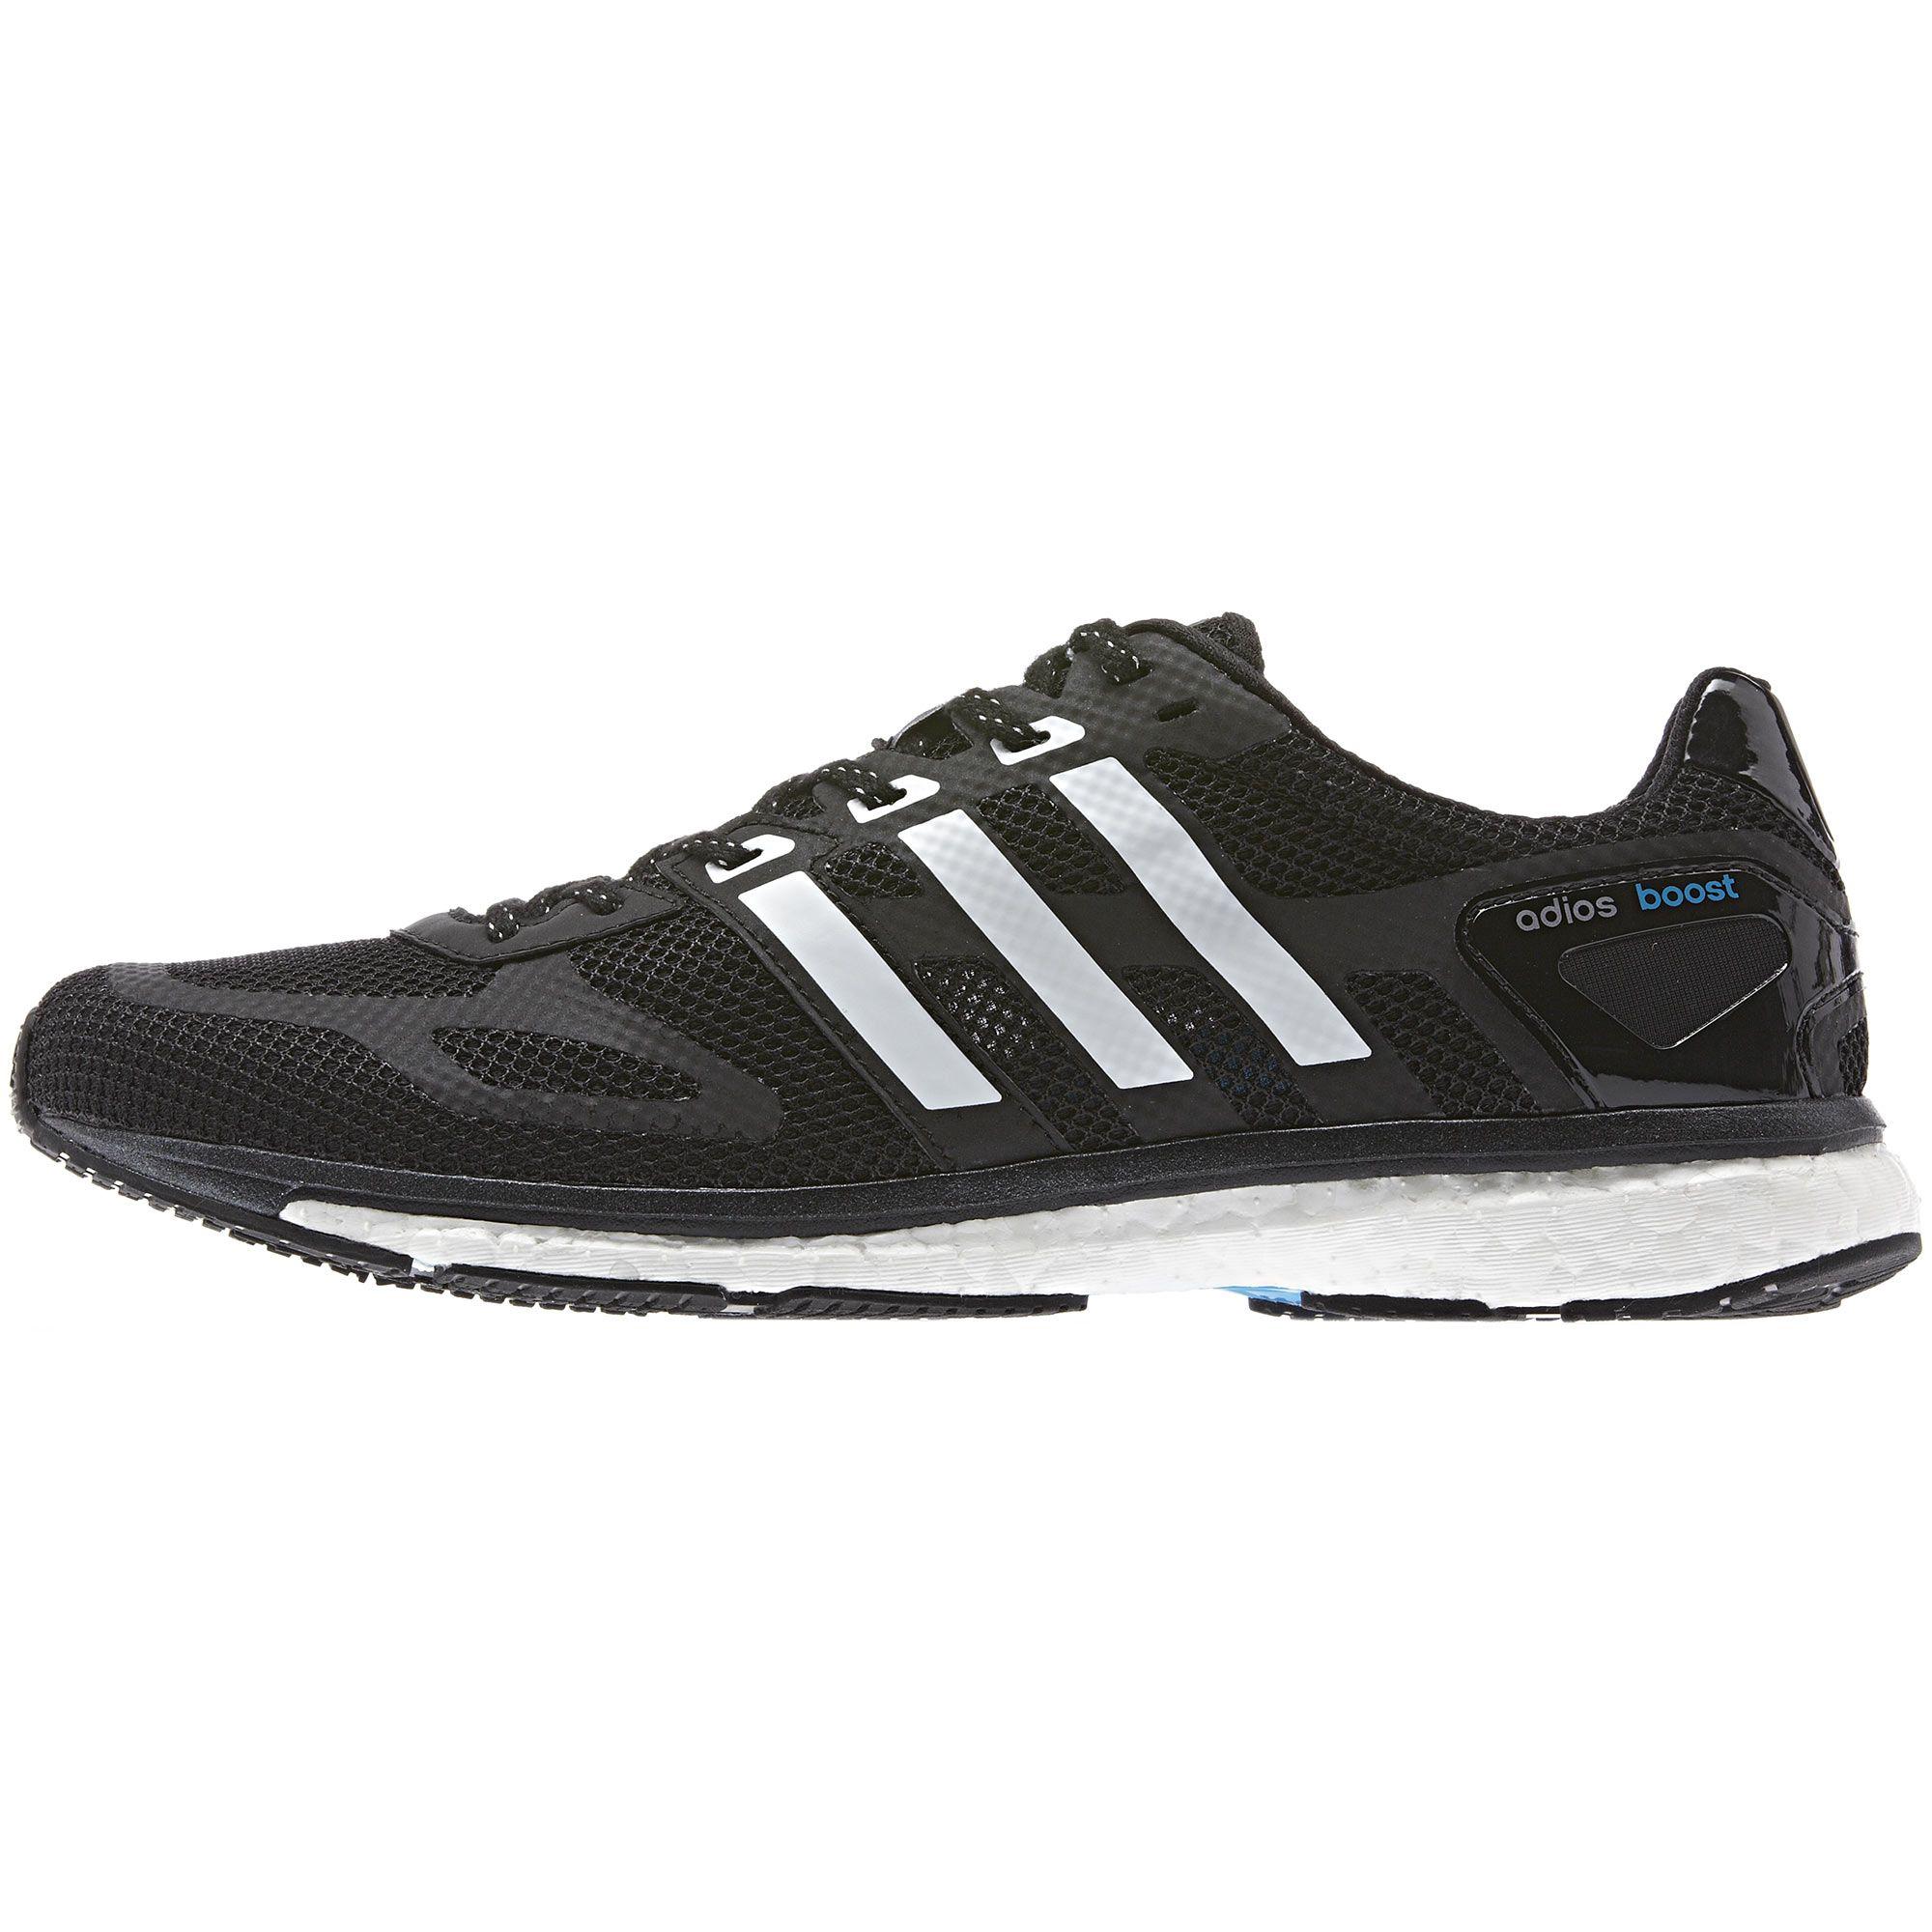 adidas Adizero Takumi Sneakers Gr. UK 4 q6TLi